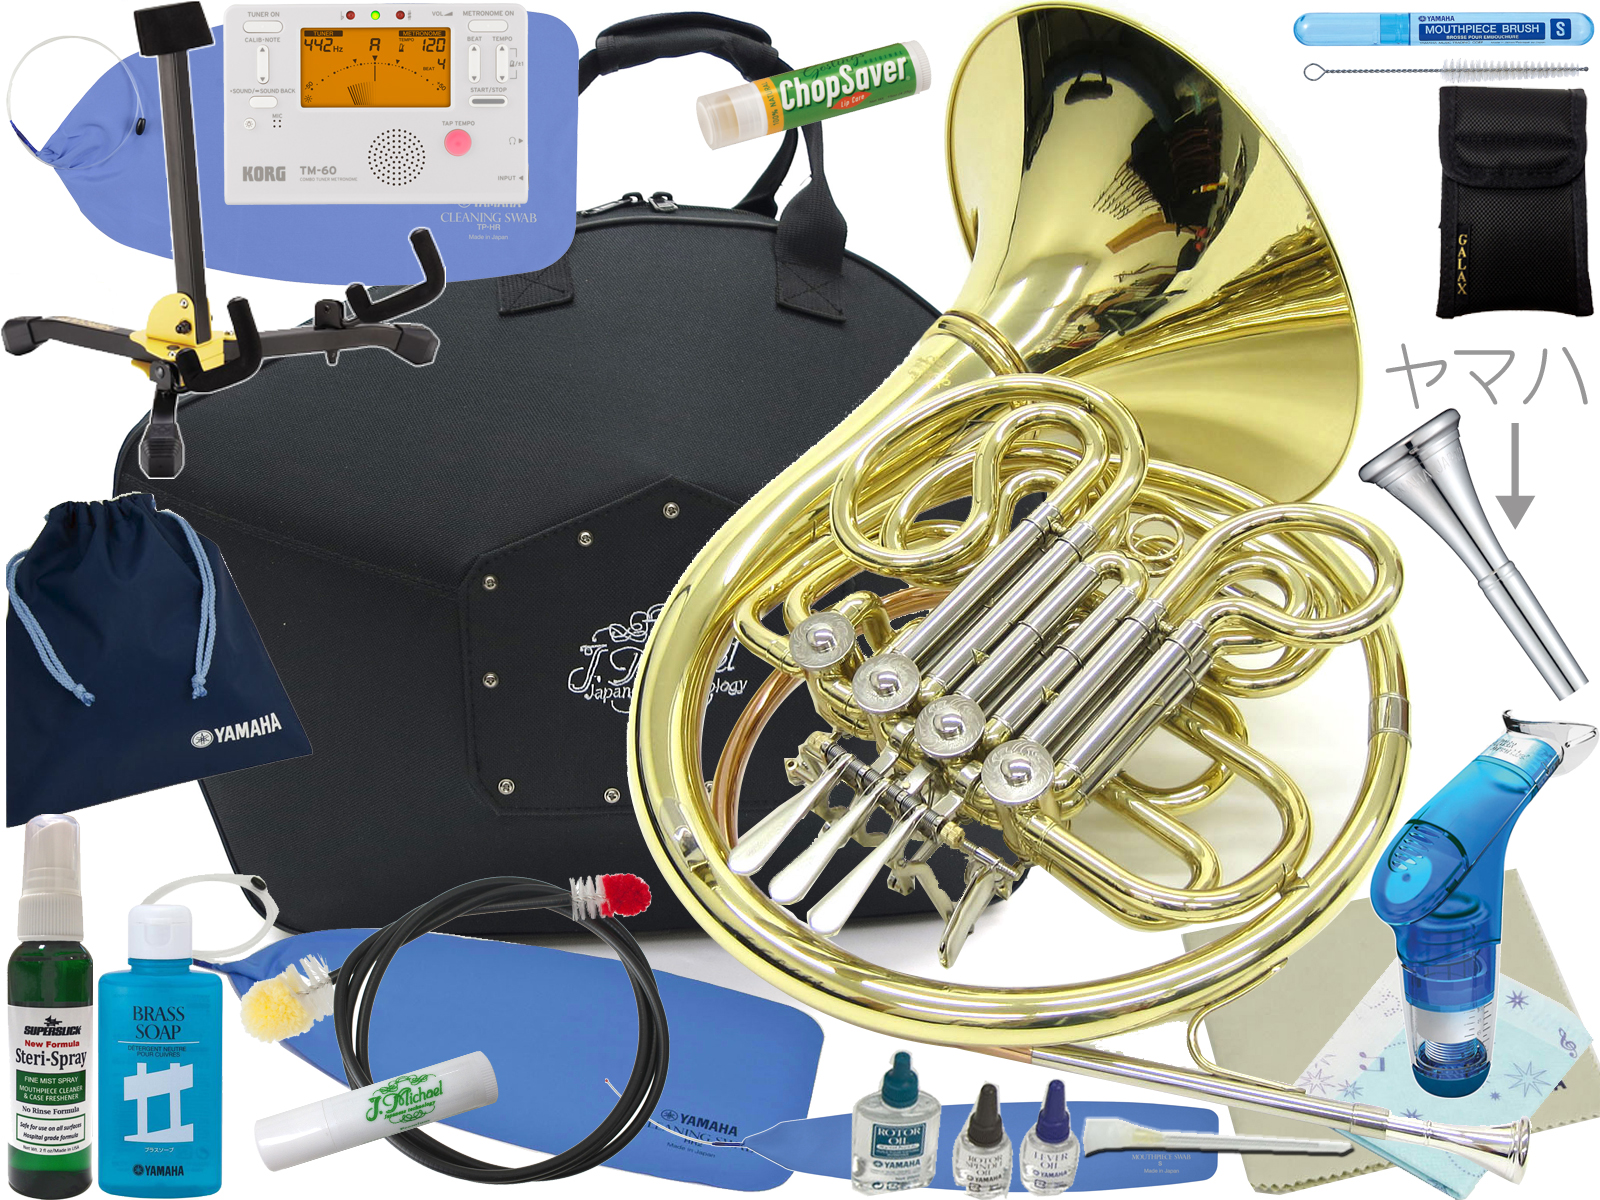 J Michael ( Jマイケル ) FH-850 ホルン 4ロータリー F/B♭ フルダブルホルン 管楽器 フレンチホルン 初心者 ダブルホルン 【 FH850 セット K】 送料無料